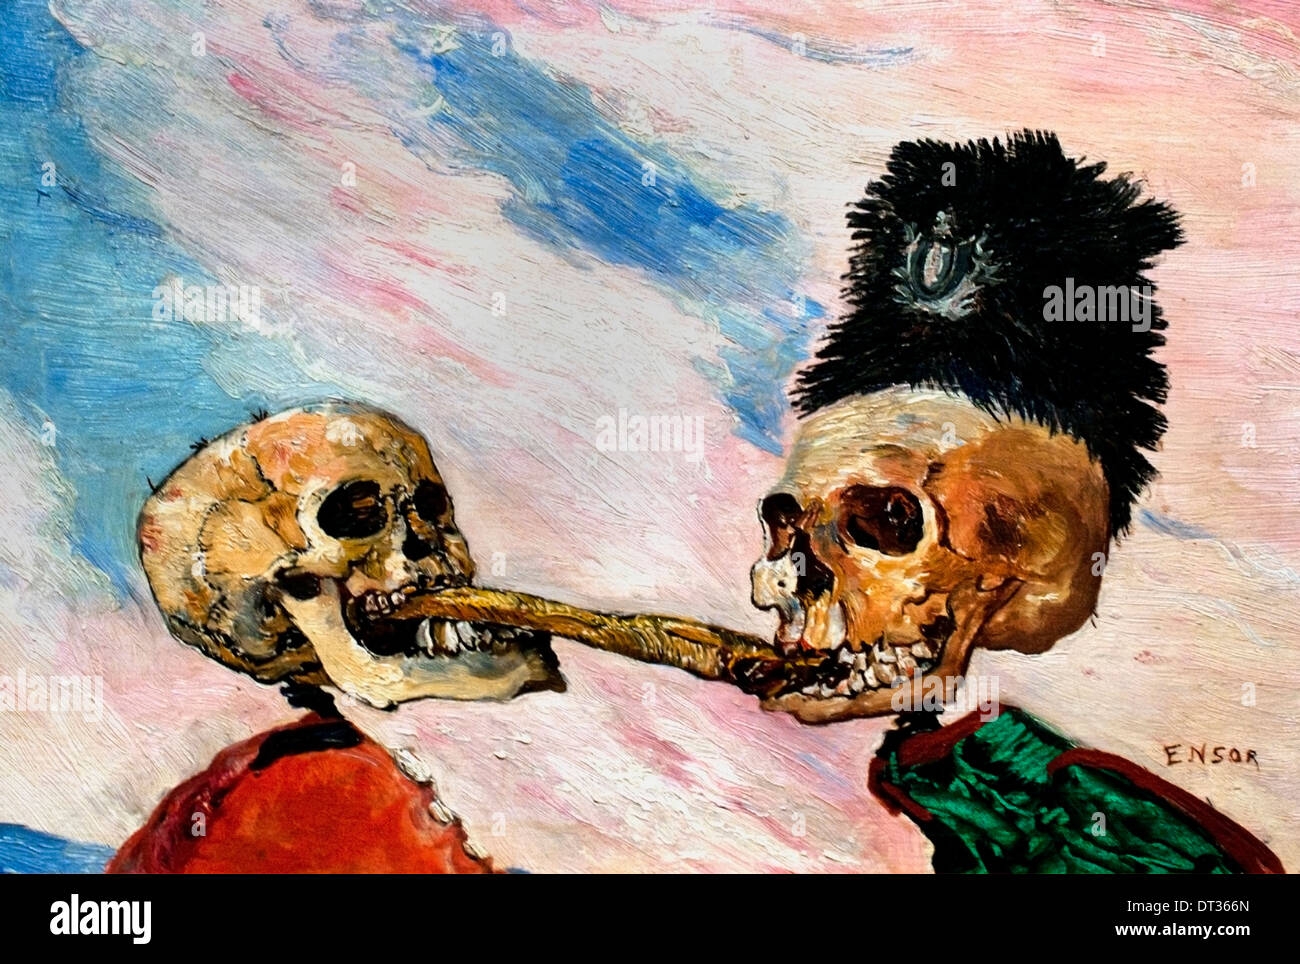 Skeletons Fighting over a Smoked Herring  by James Ensor 1860-1949 Belgium Belgian - Stock Image